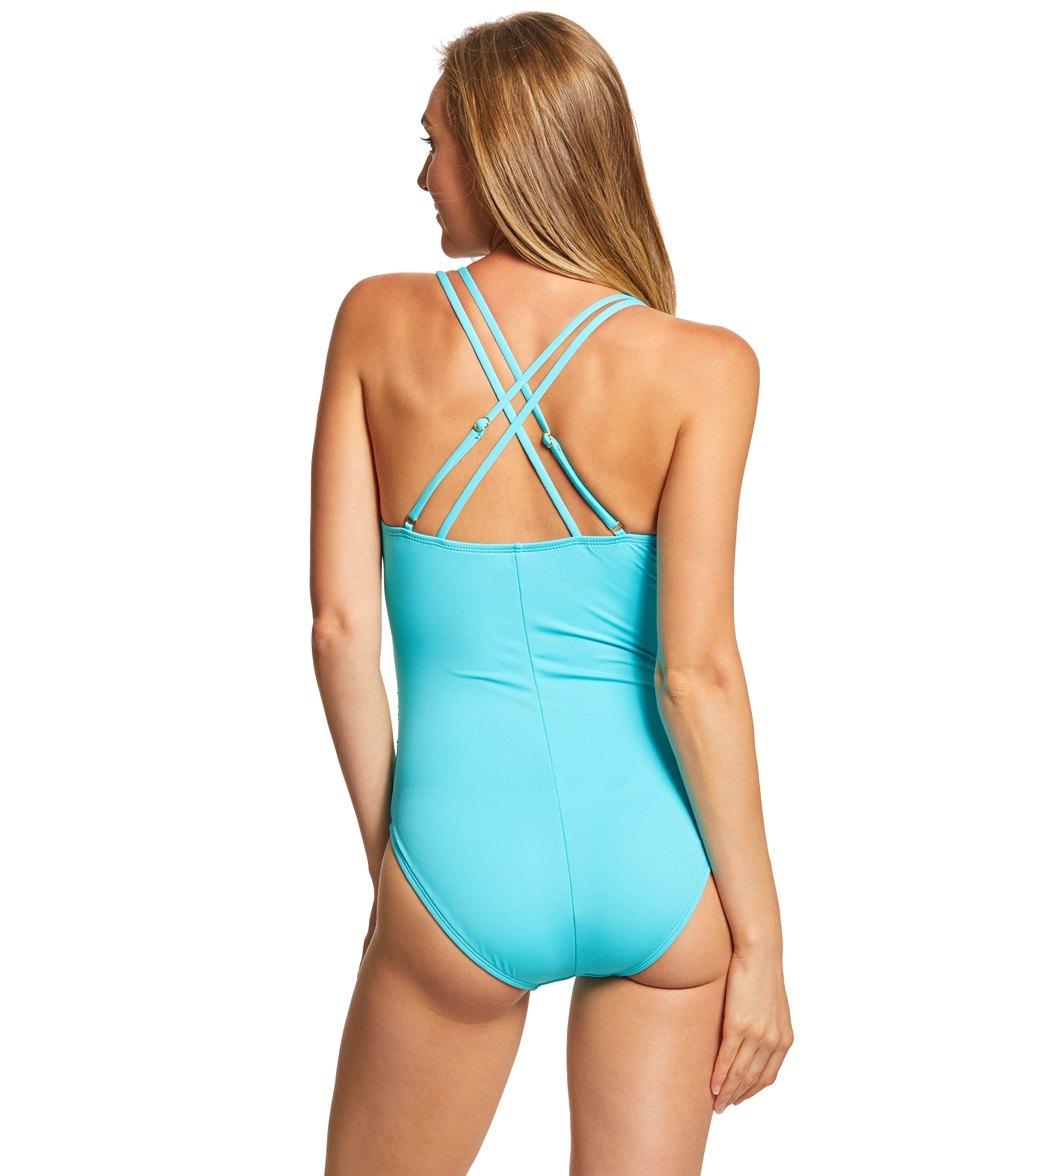 fabb5cf435e14 La Blanca Island Goddess Underwire Surplice One Piece Swimsuit at ...